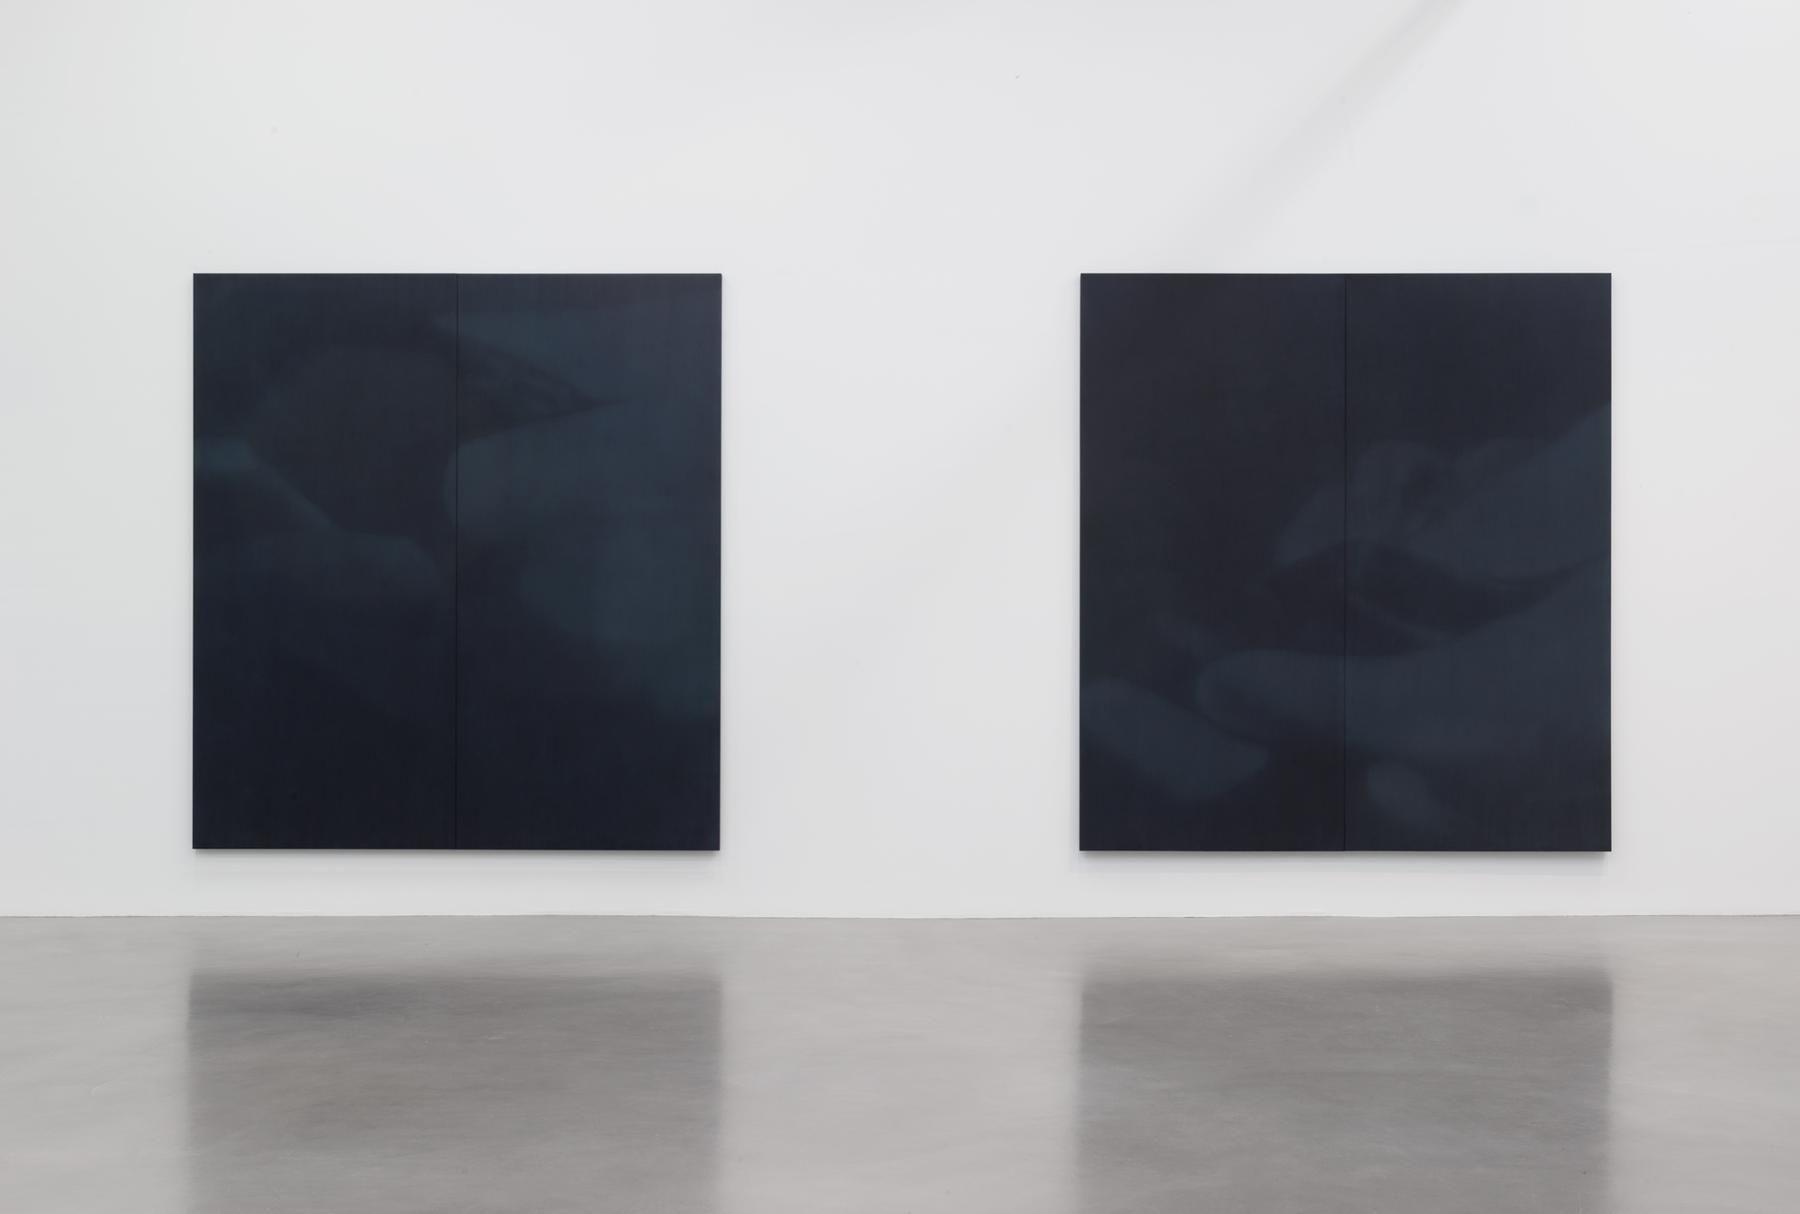 Troy Brauntuch Installation view 13